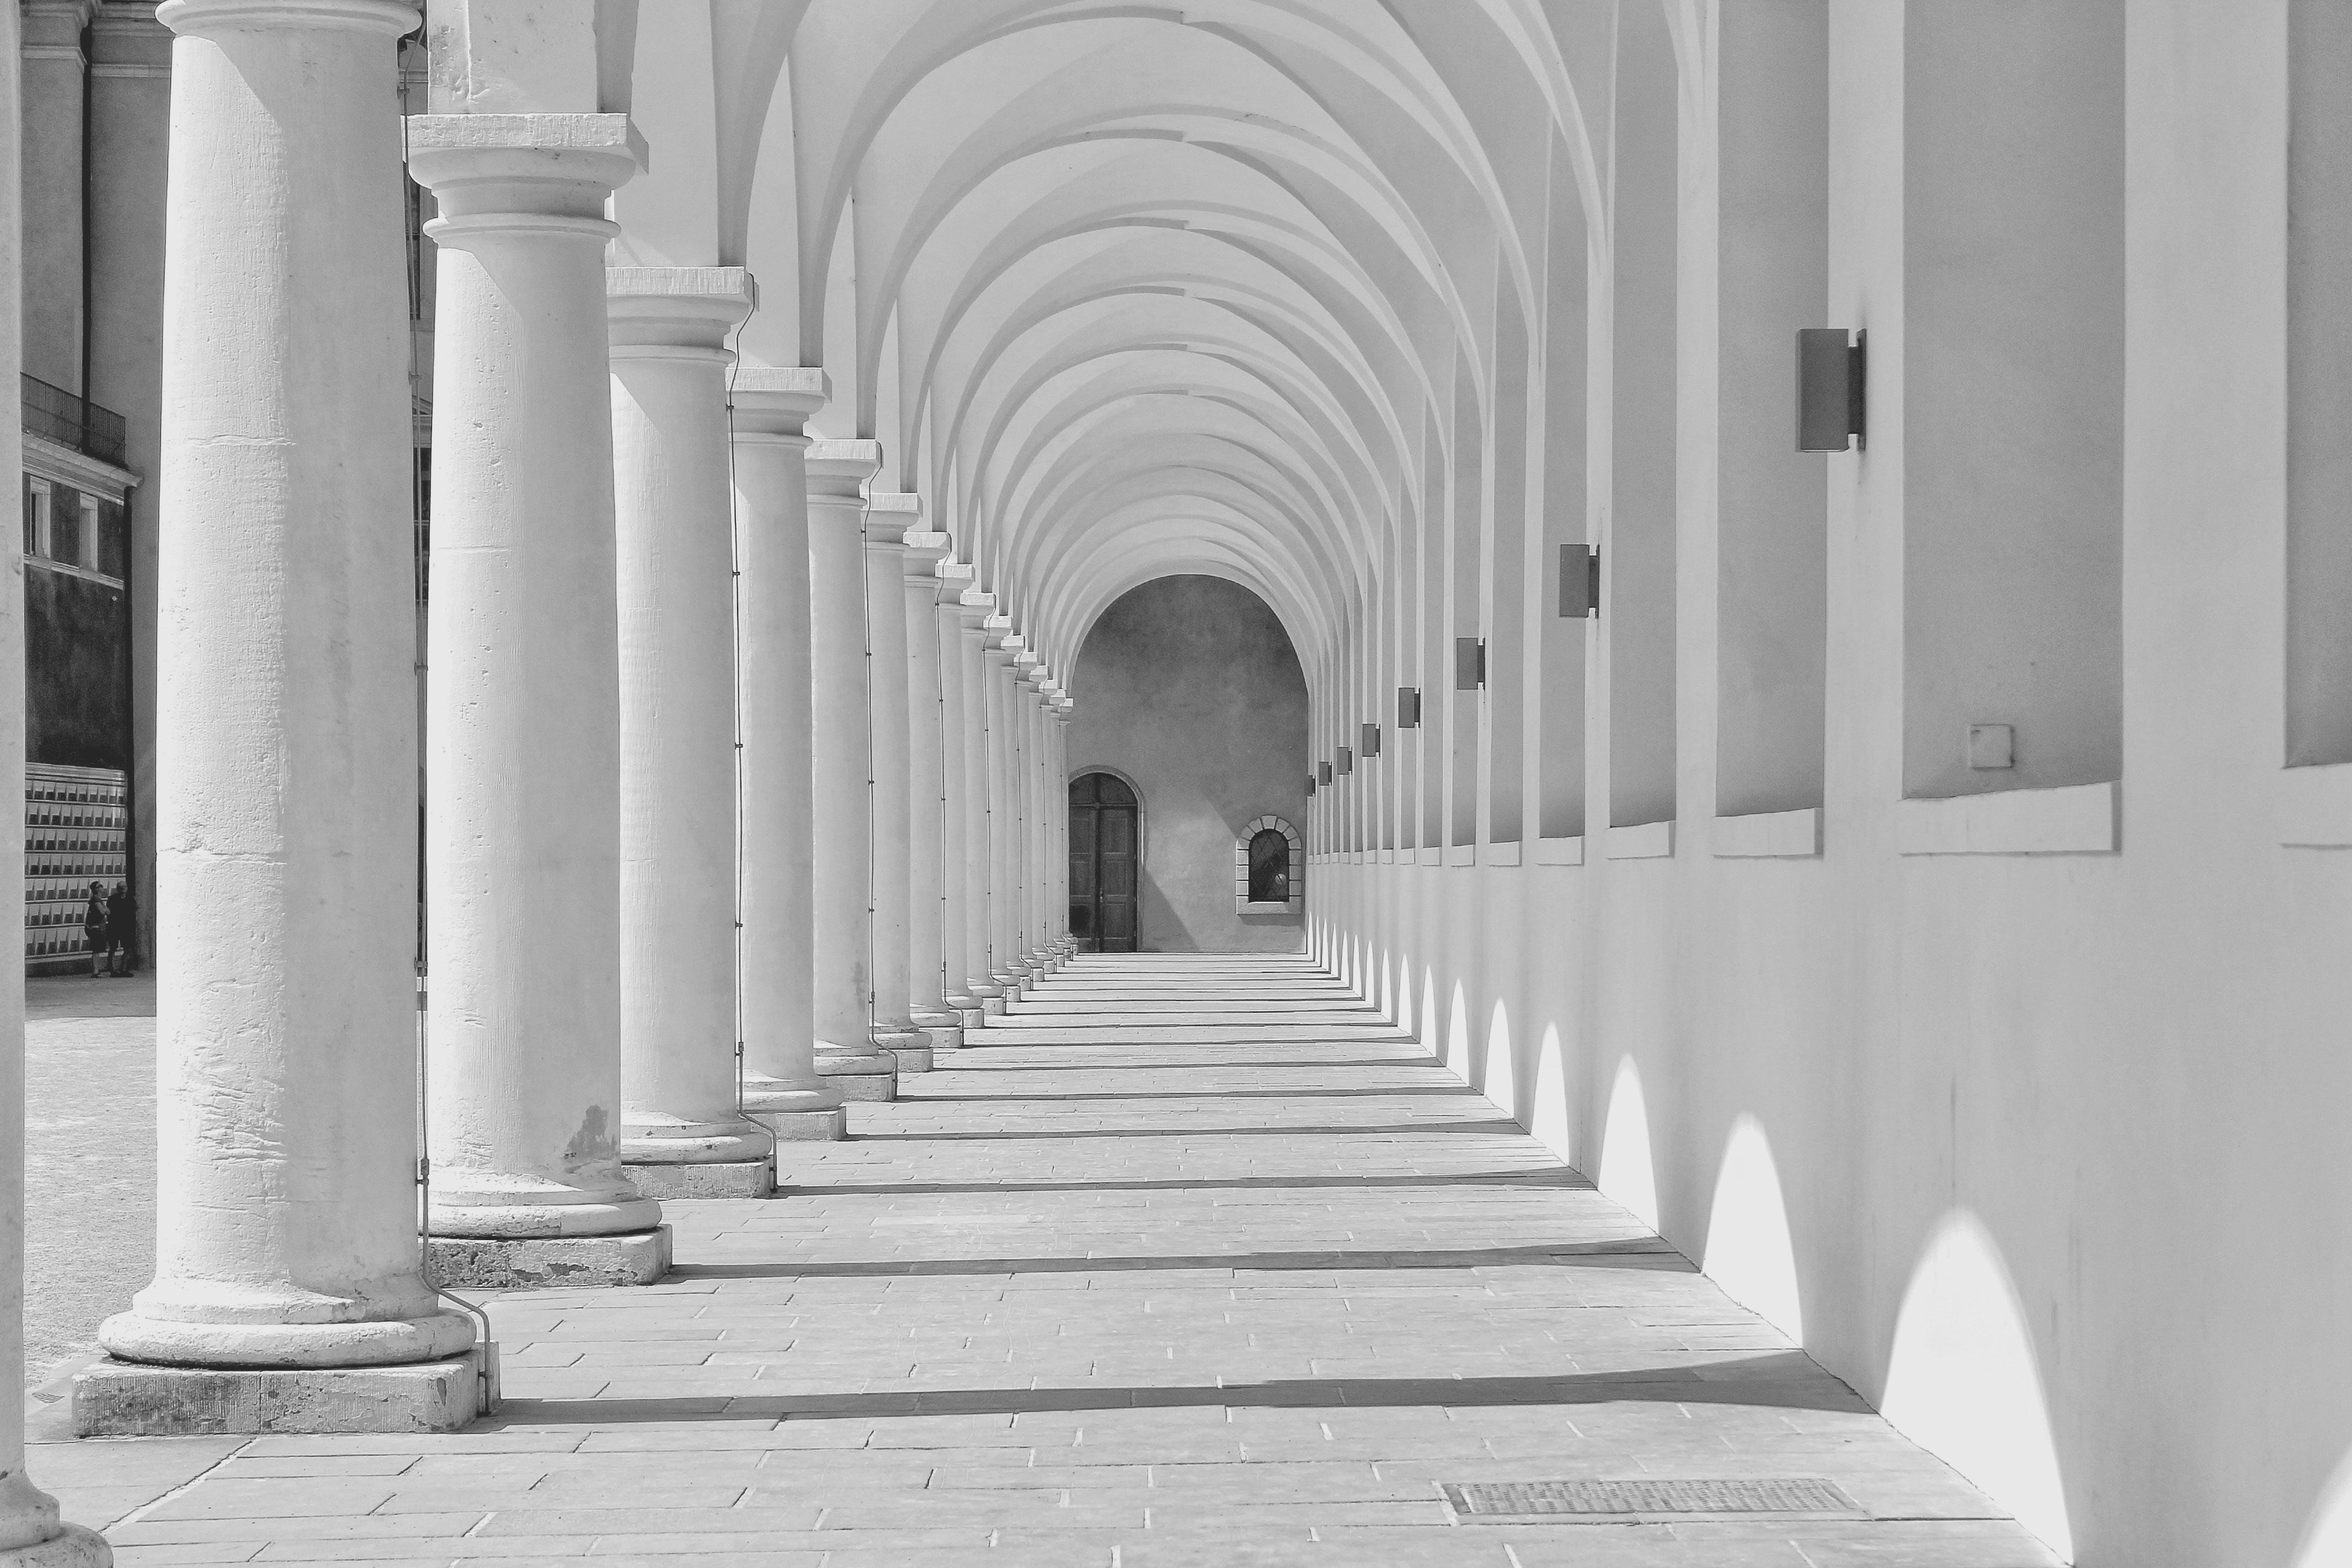 Free stock photo of city, Vecchio, archi, palazzo